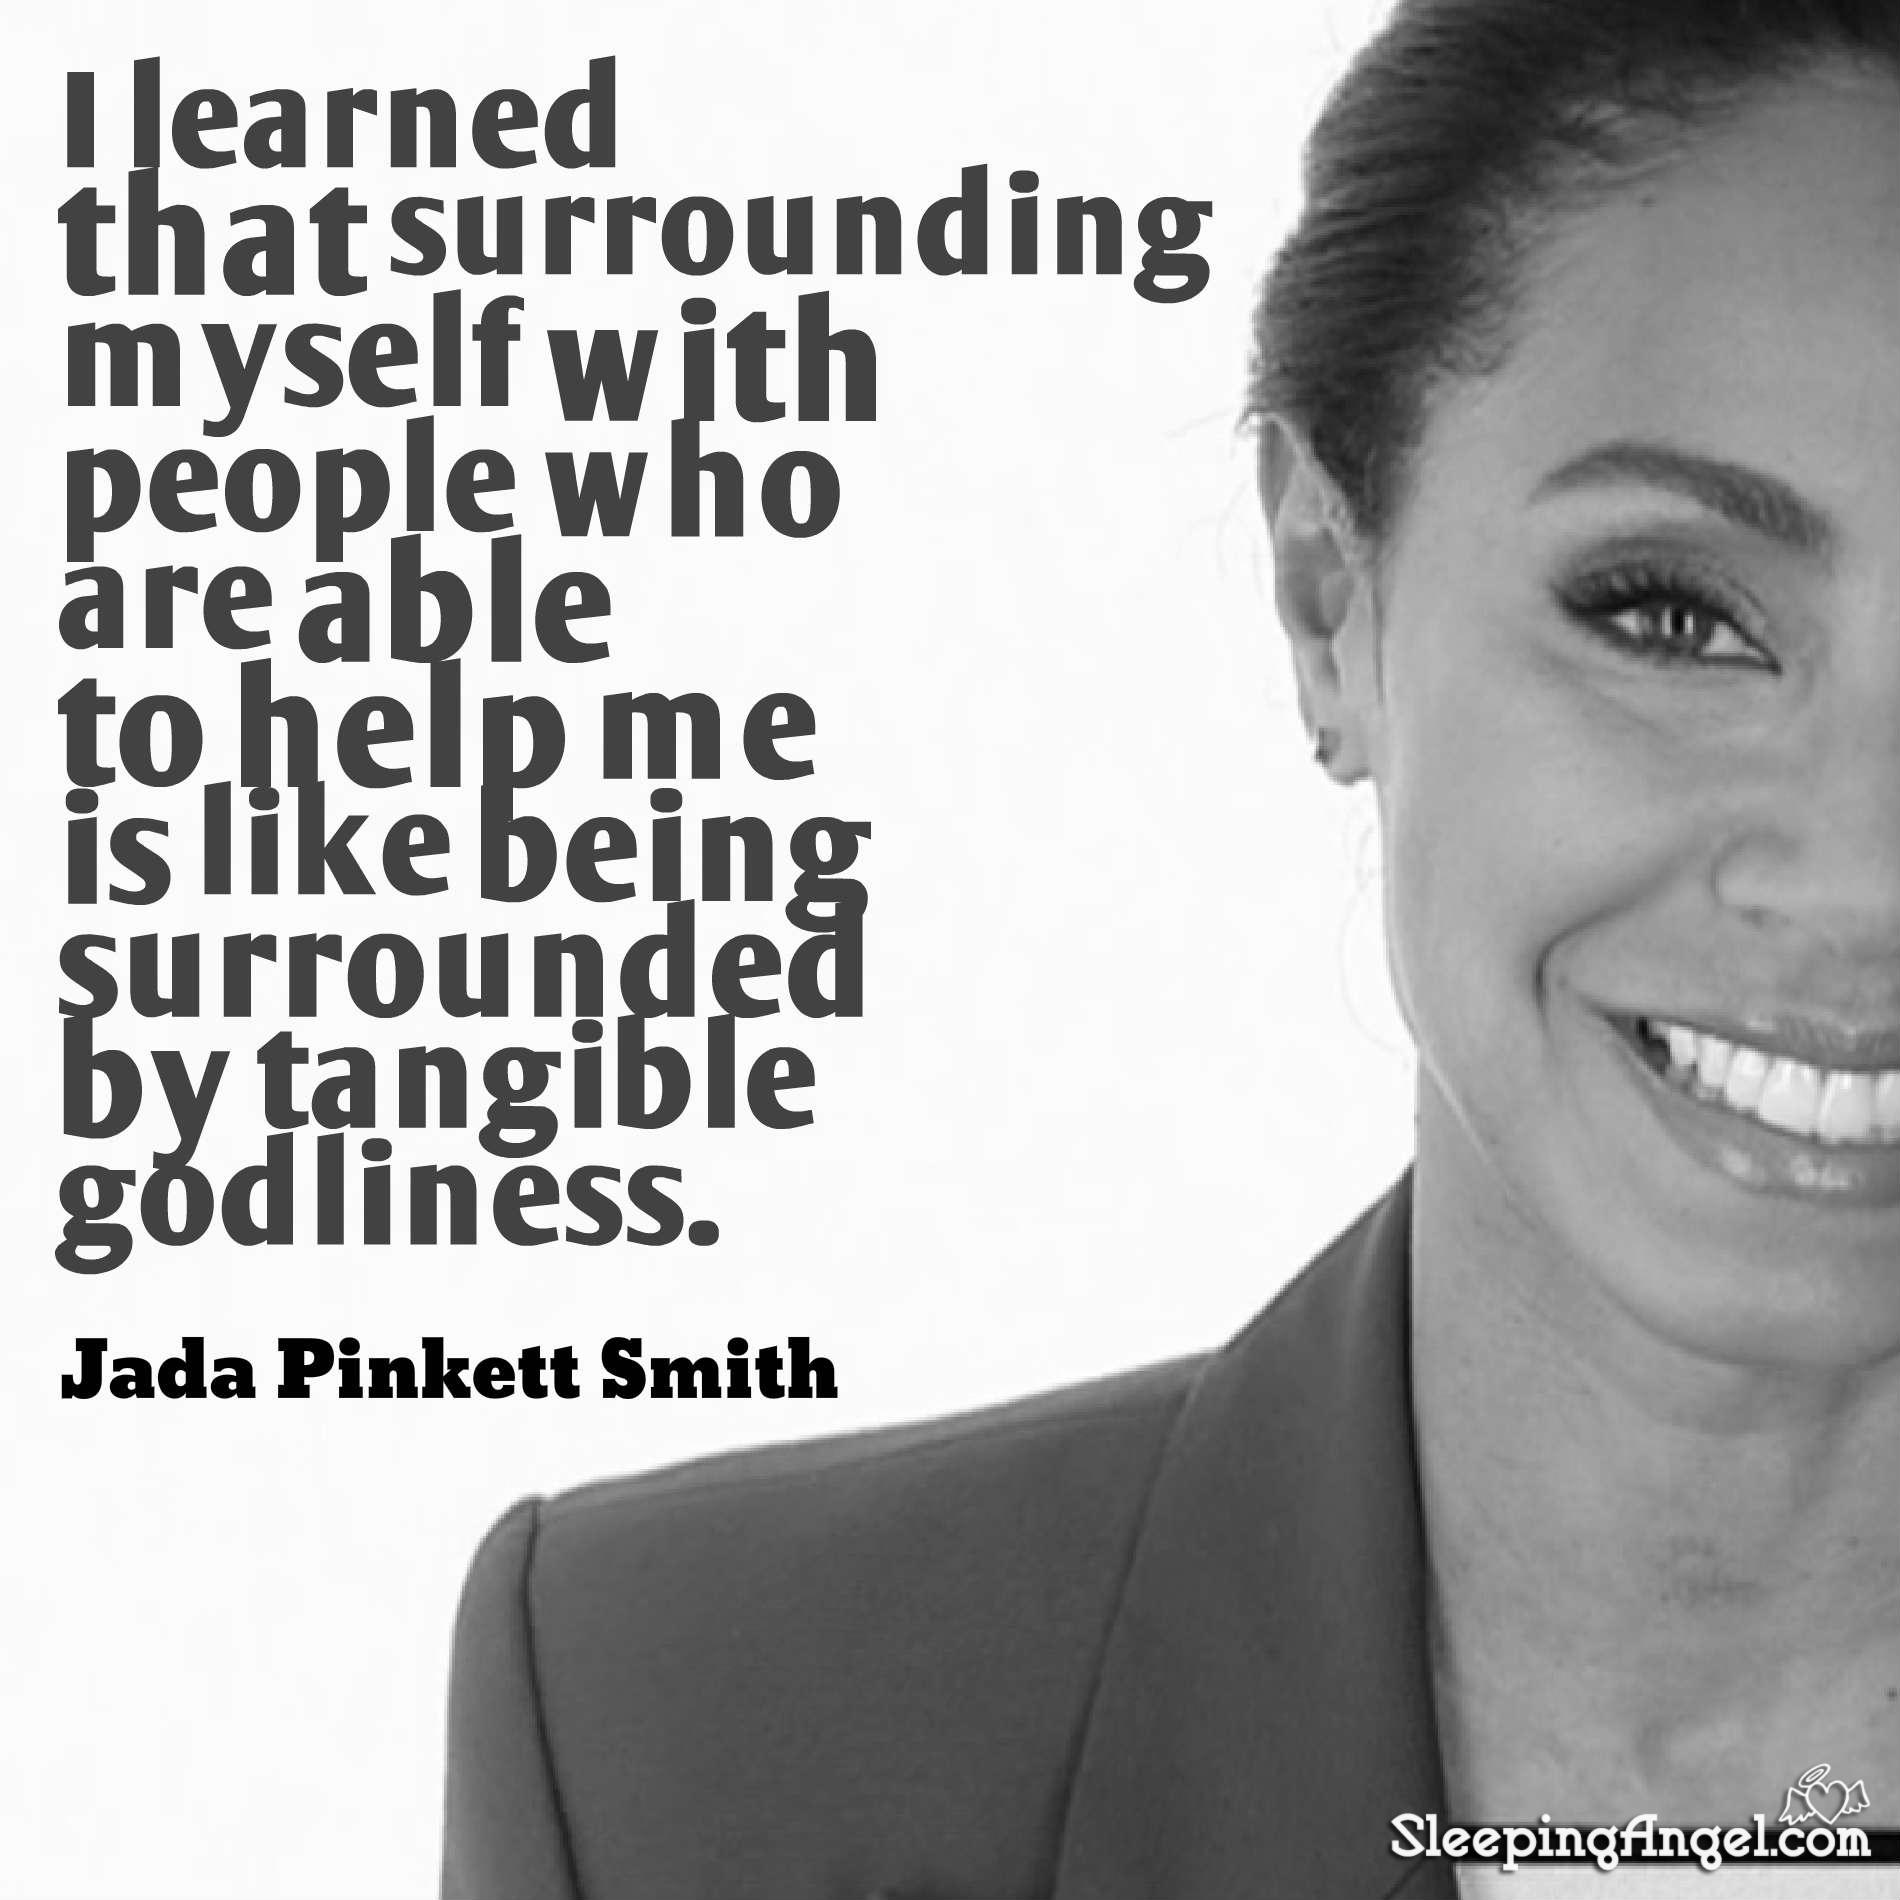 Jada Pinkett Smith Quote